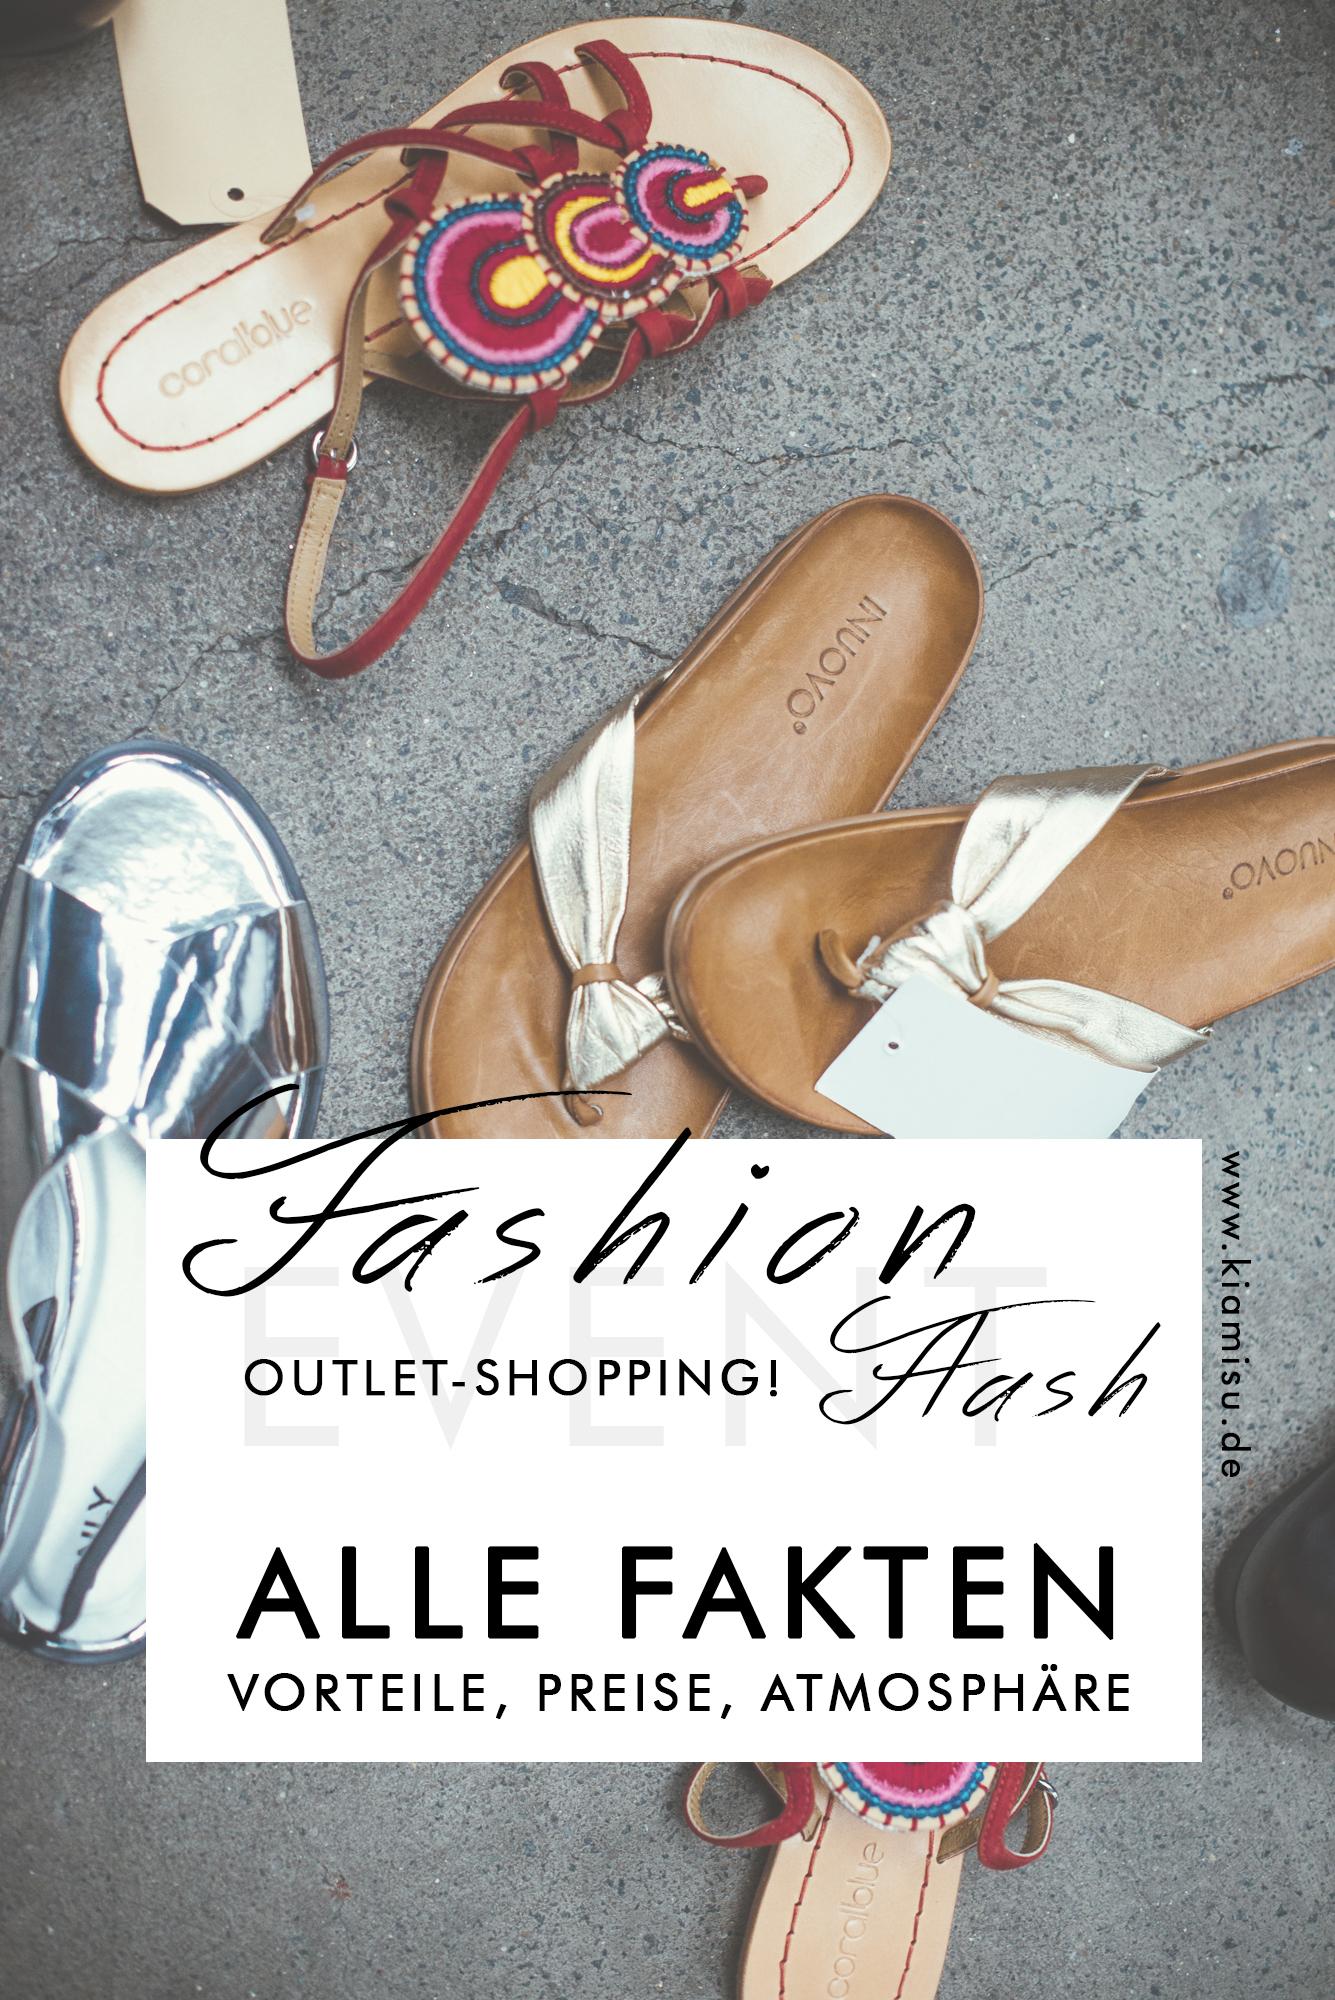 Fashion Flash Erfahrung_Göttingen_Lokhalle_Modeblog-Makren_Preise_Final 1